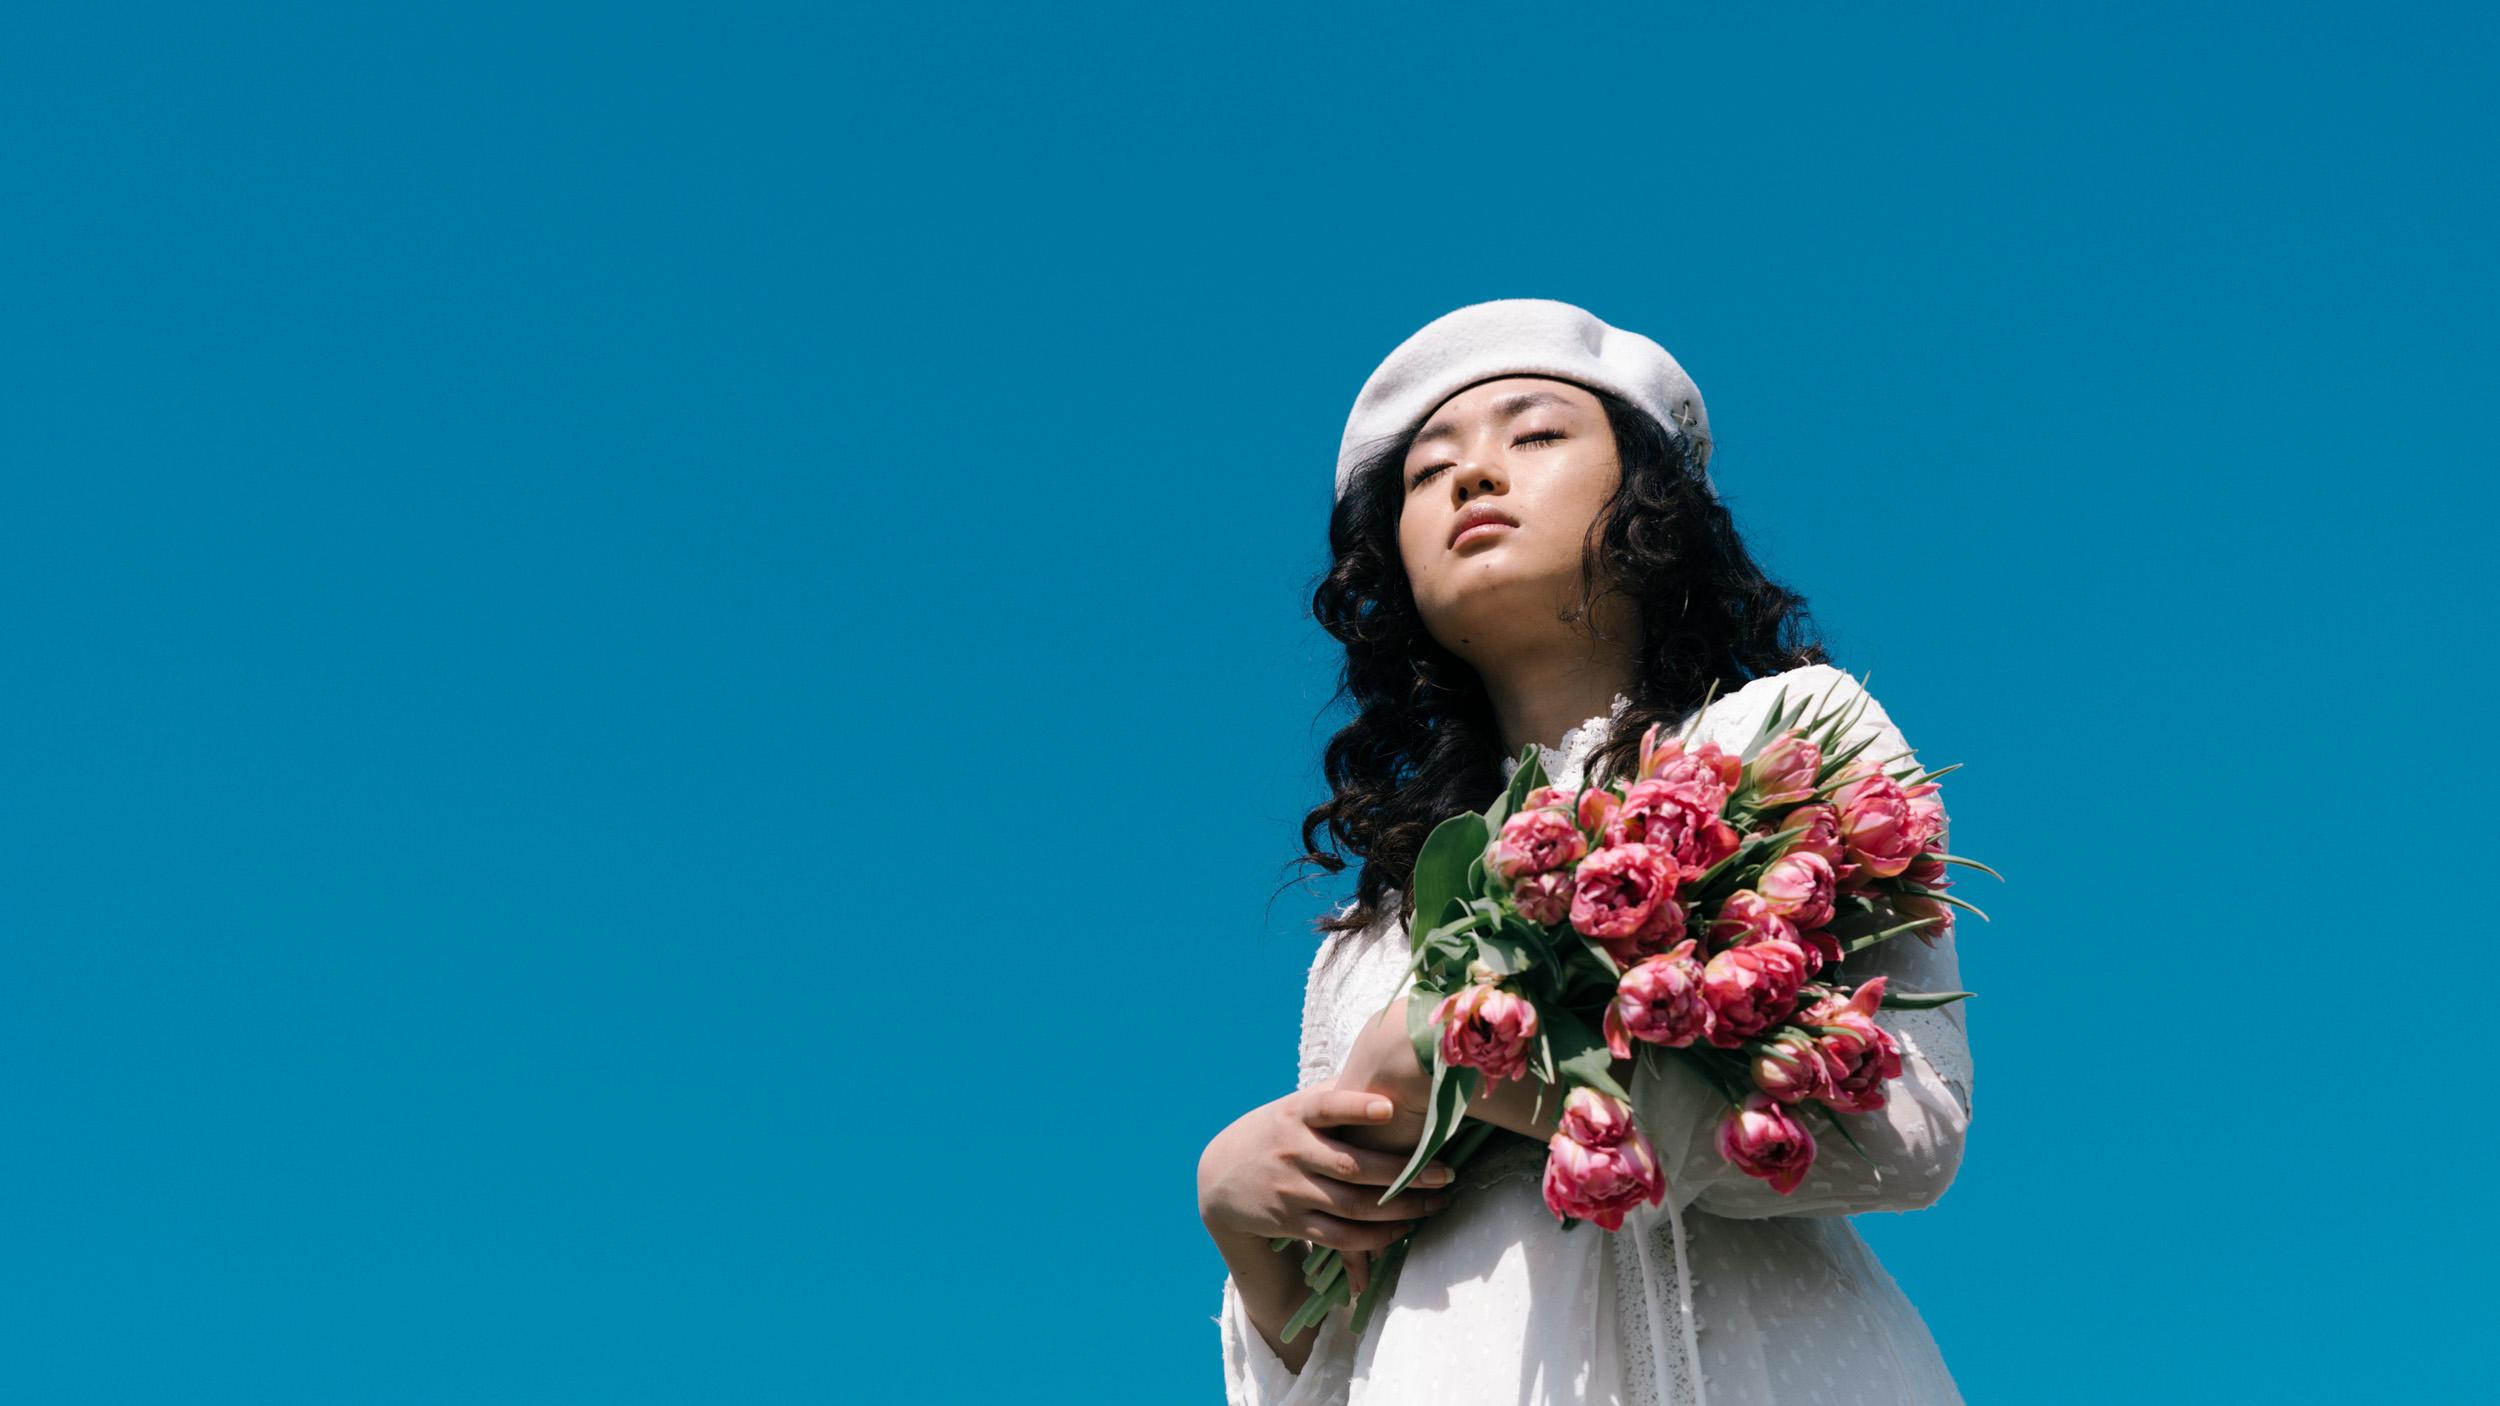 Review Fashion Fotografie mit Kicki Yang Zh | Jill Abanico Fotografie - Ruhrgebiet